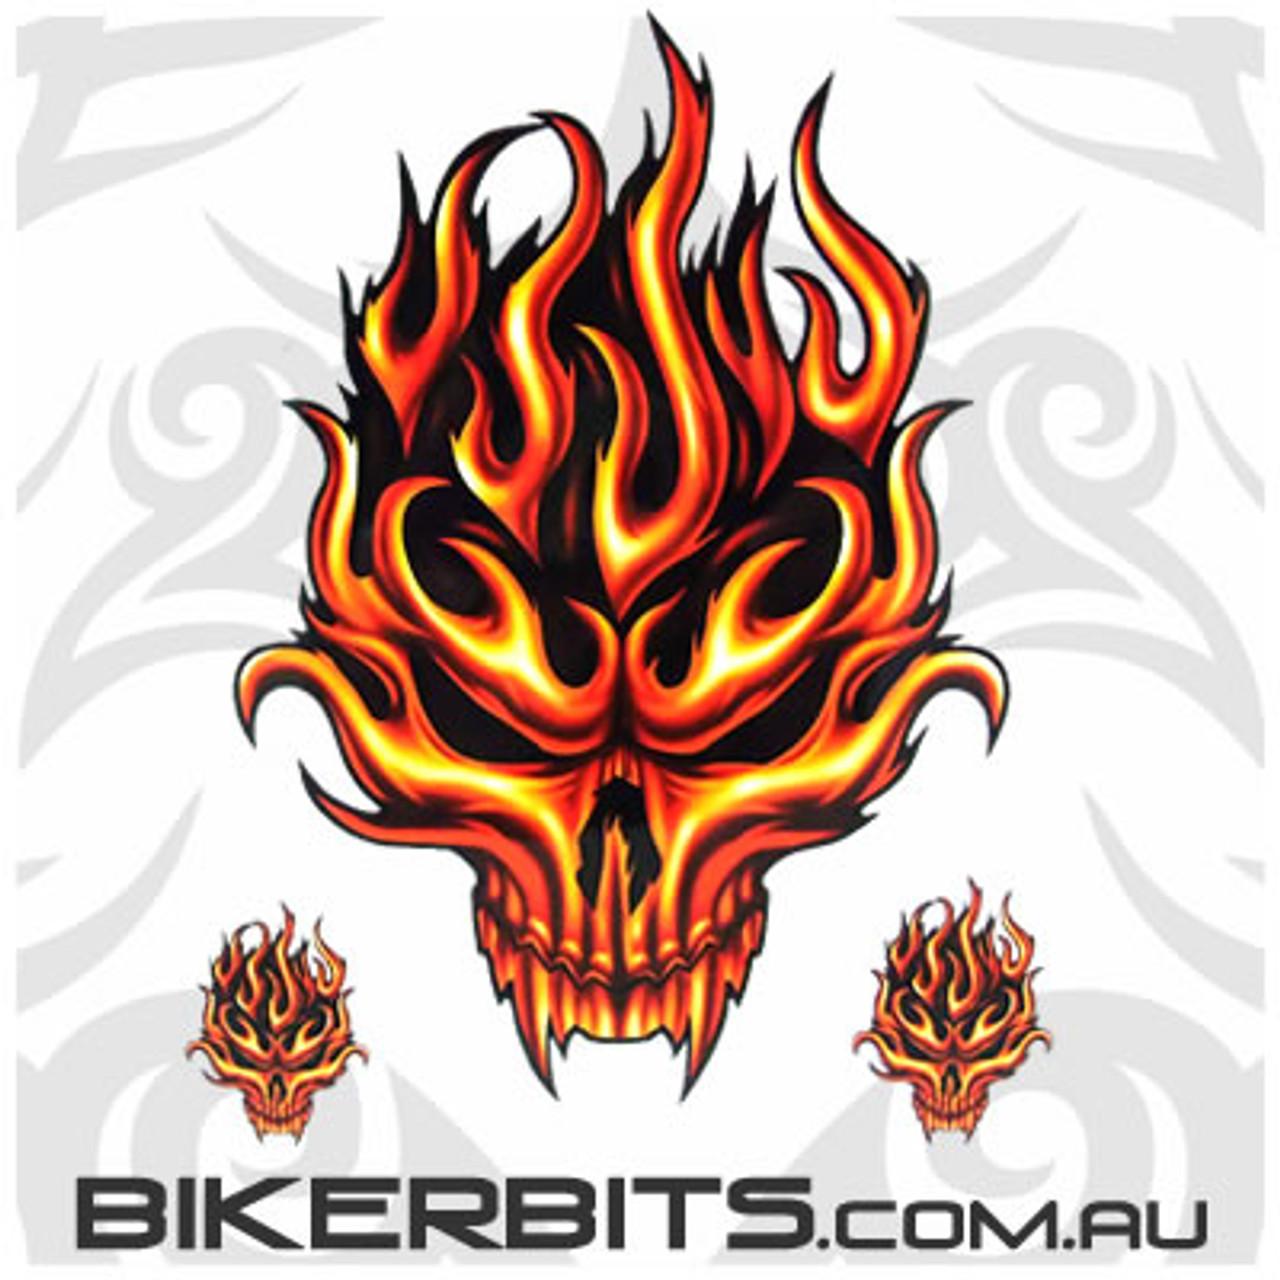 Biker Decal - Flame Skull Set